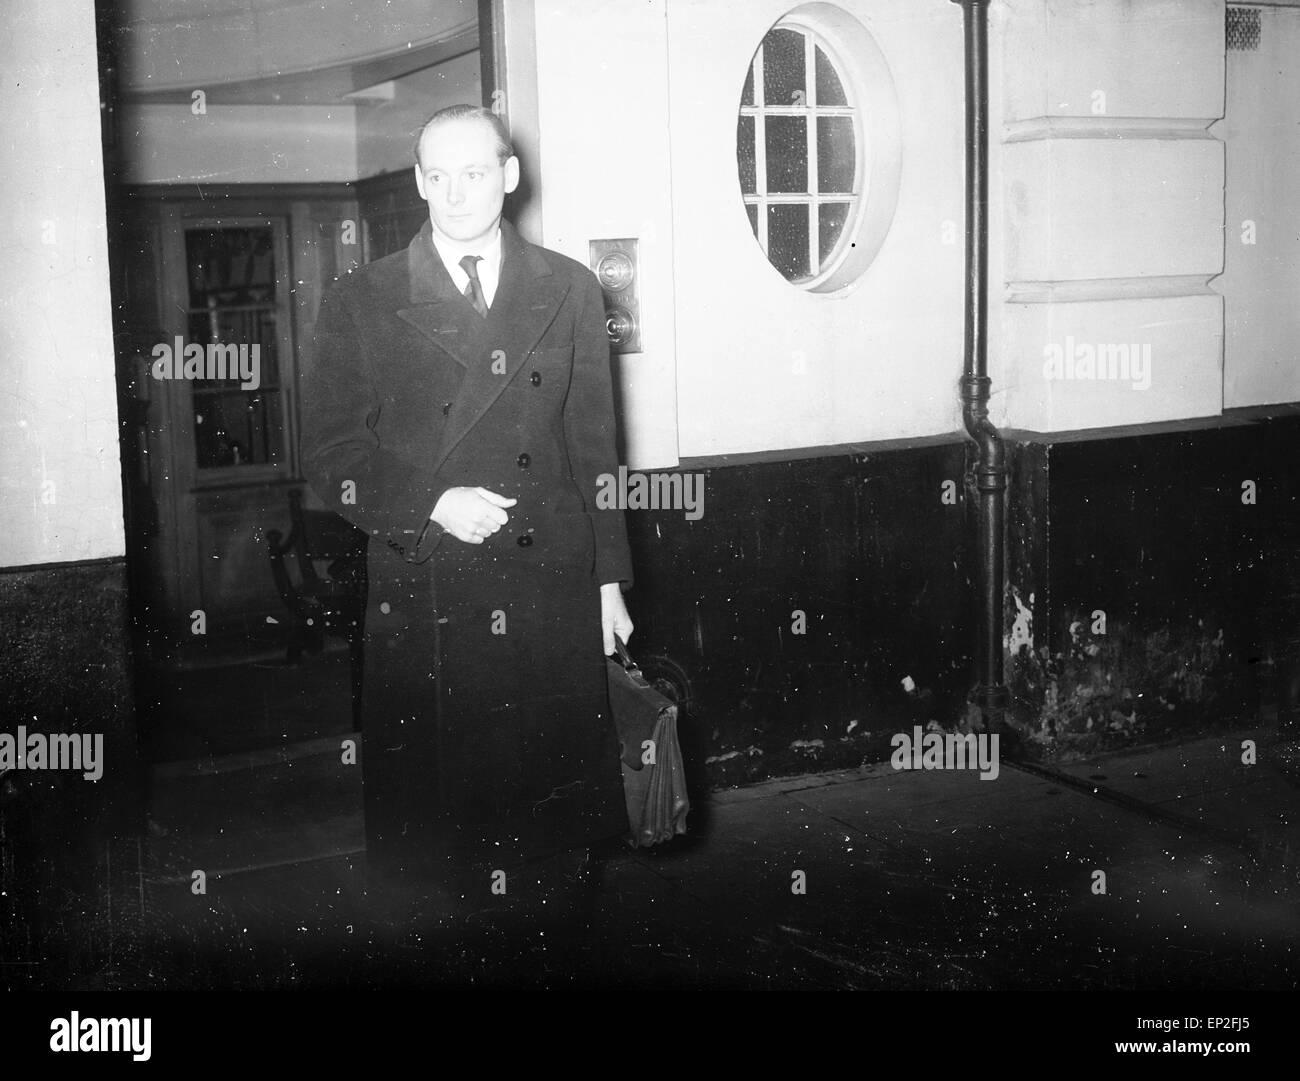 Edward Douglas-Scott-Montagu, 3rd Baron Montagu of Beaulieu, at Winchester Crown Court by car, 15th December 1953. - Stock Image